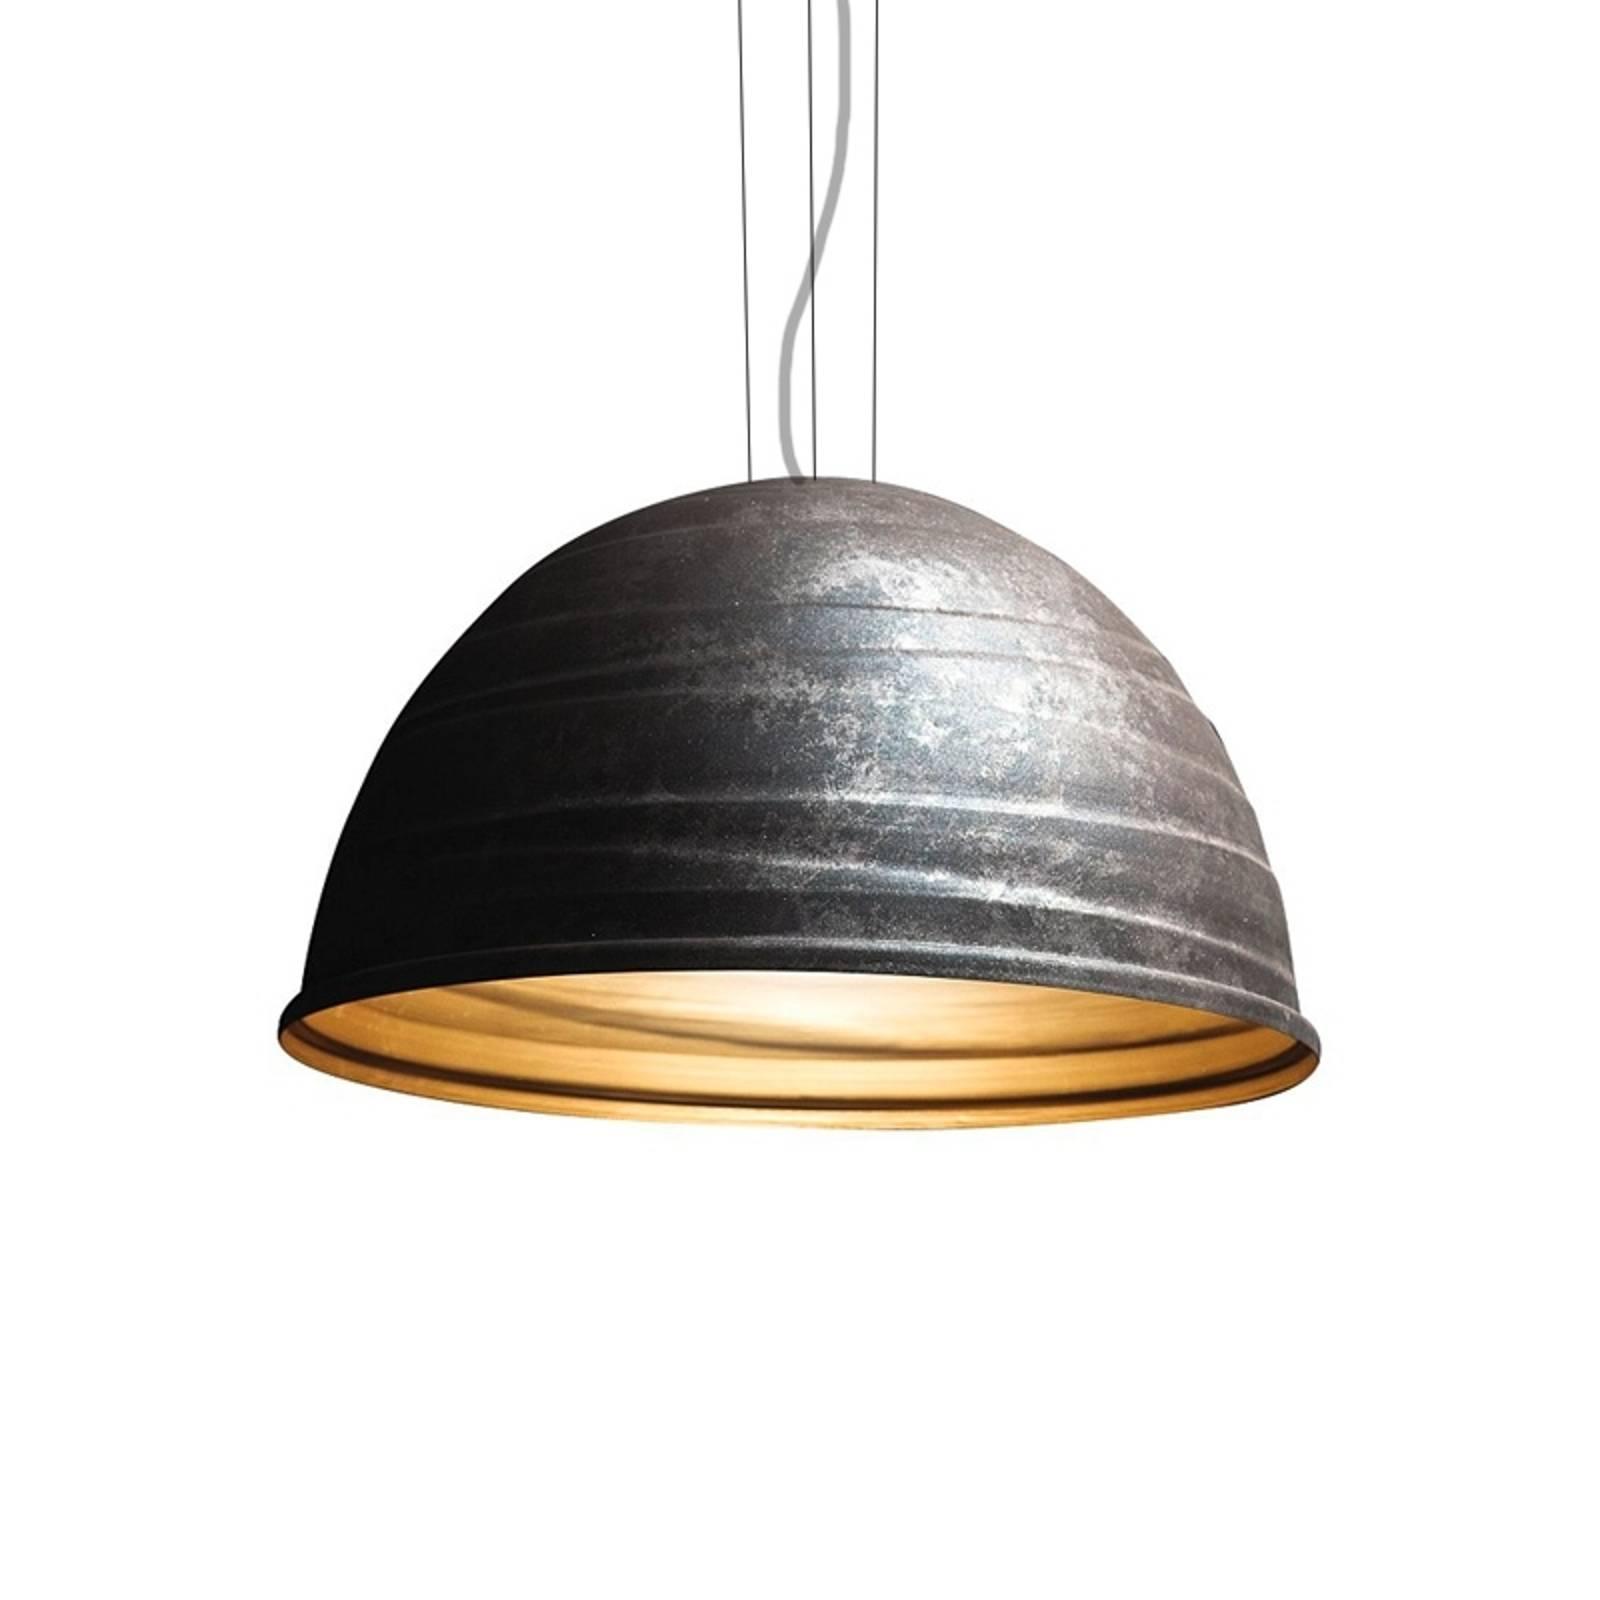 Glanzende hanglamp BABELE, 92 cm